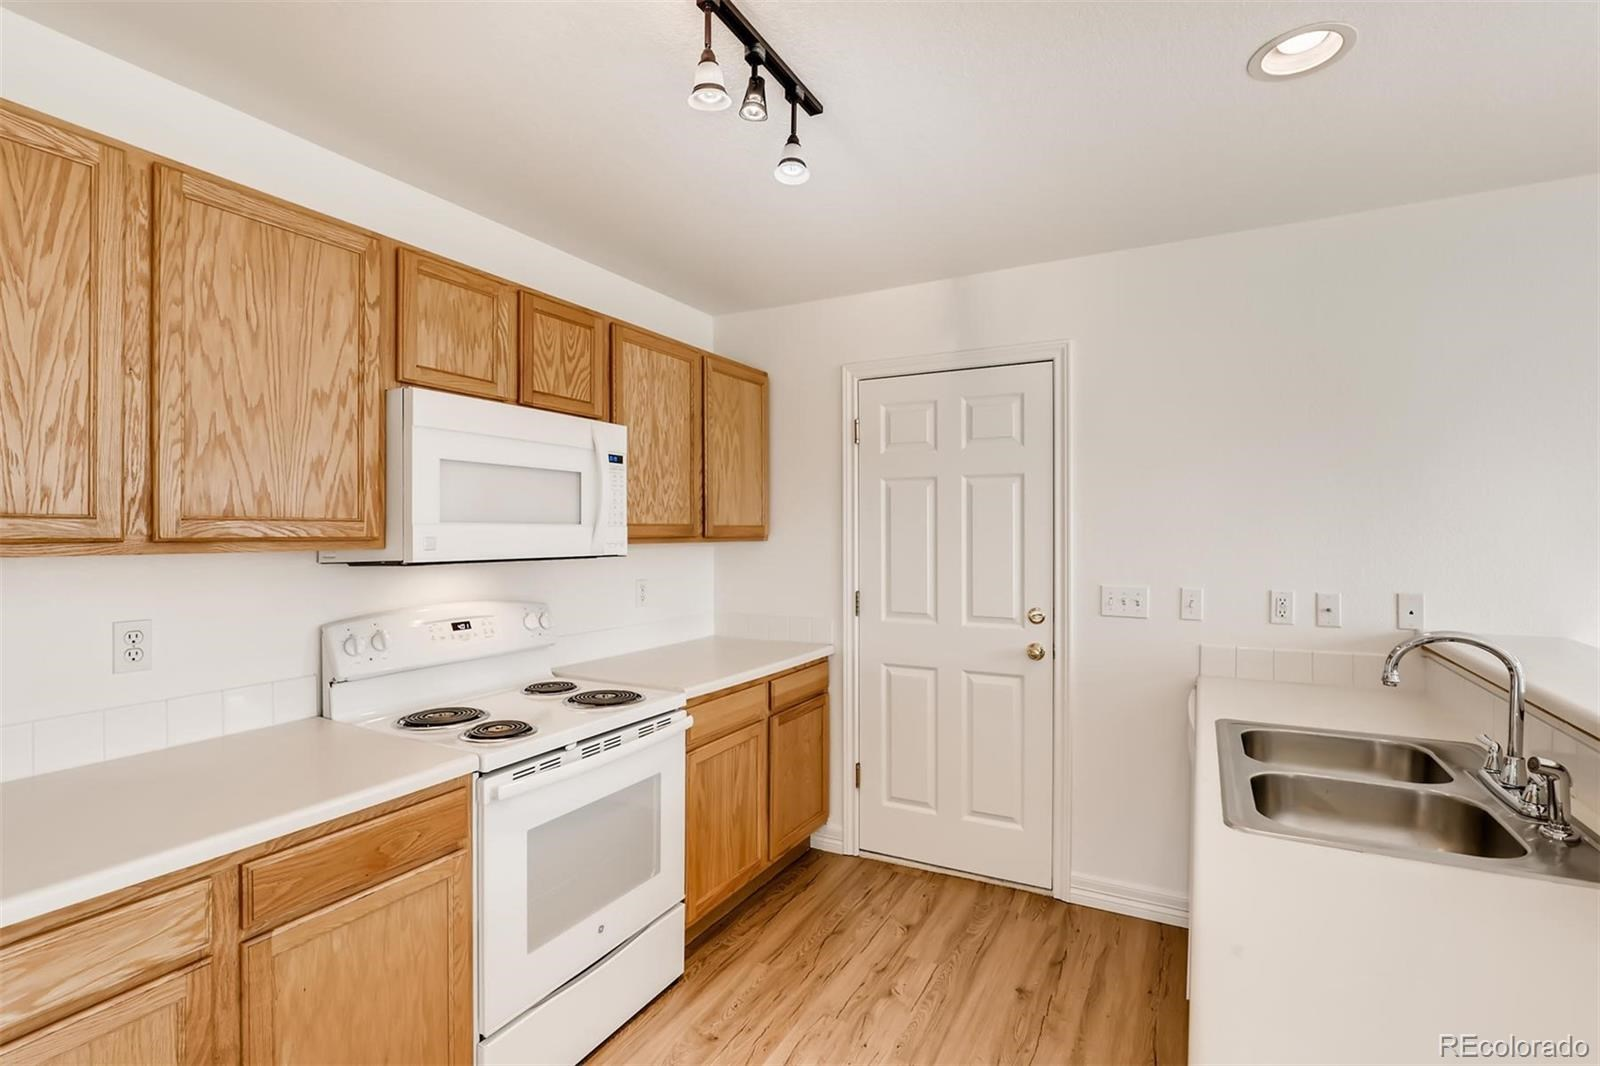 MLS# 7332667 - 8 - 1234 S Emery Street #H, Longmont, CO 80501